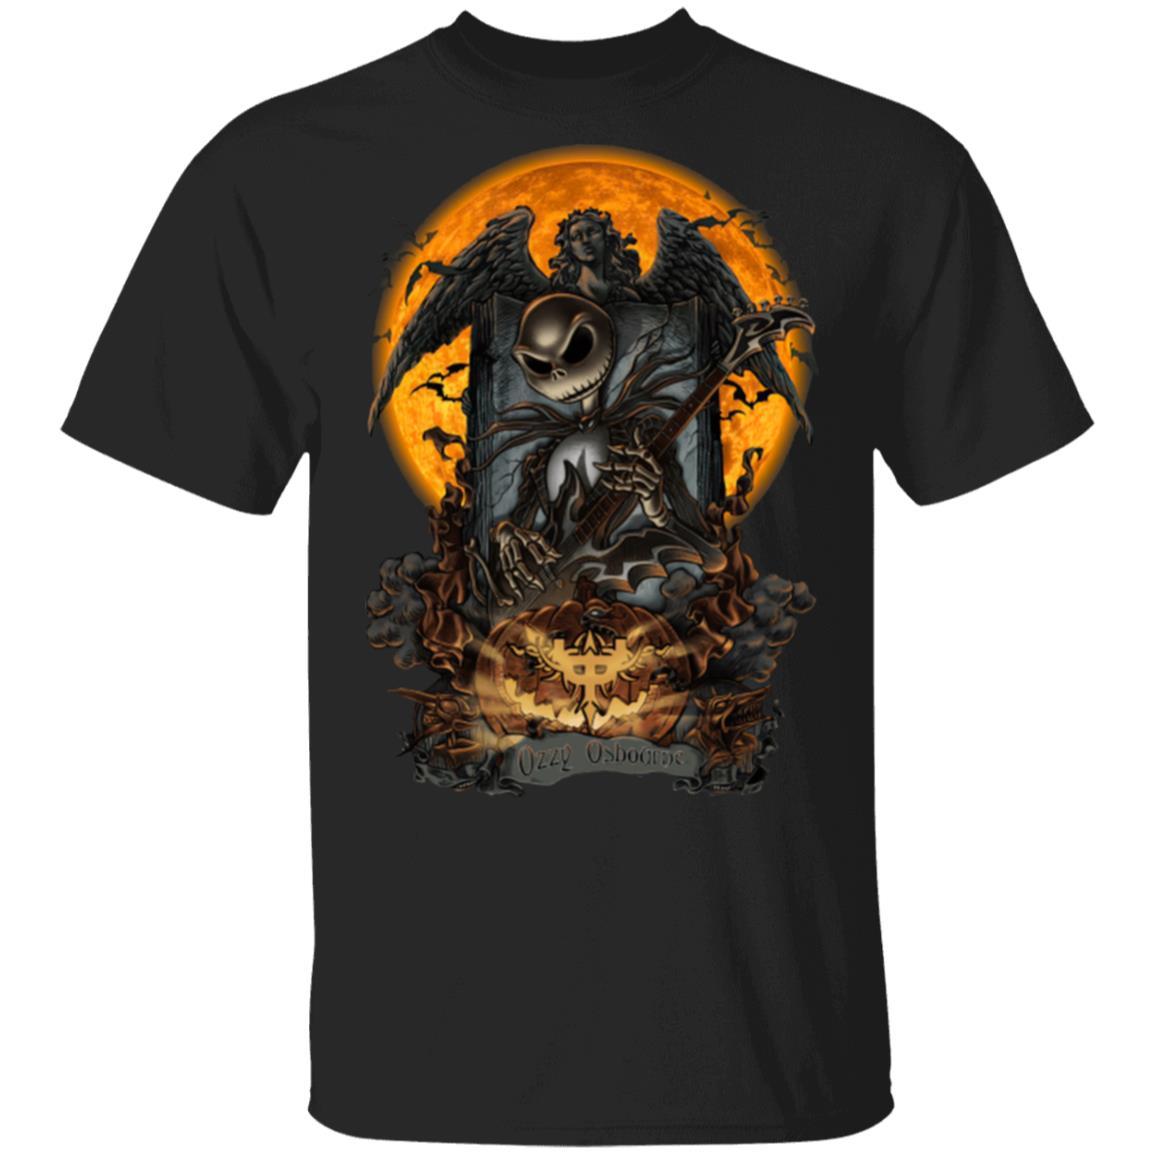 Ozzy Osbourne TShirt Jack Skellington Bat Halloween